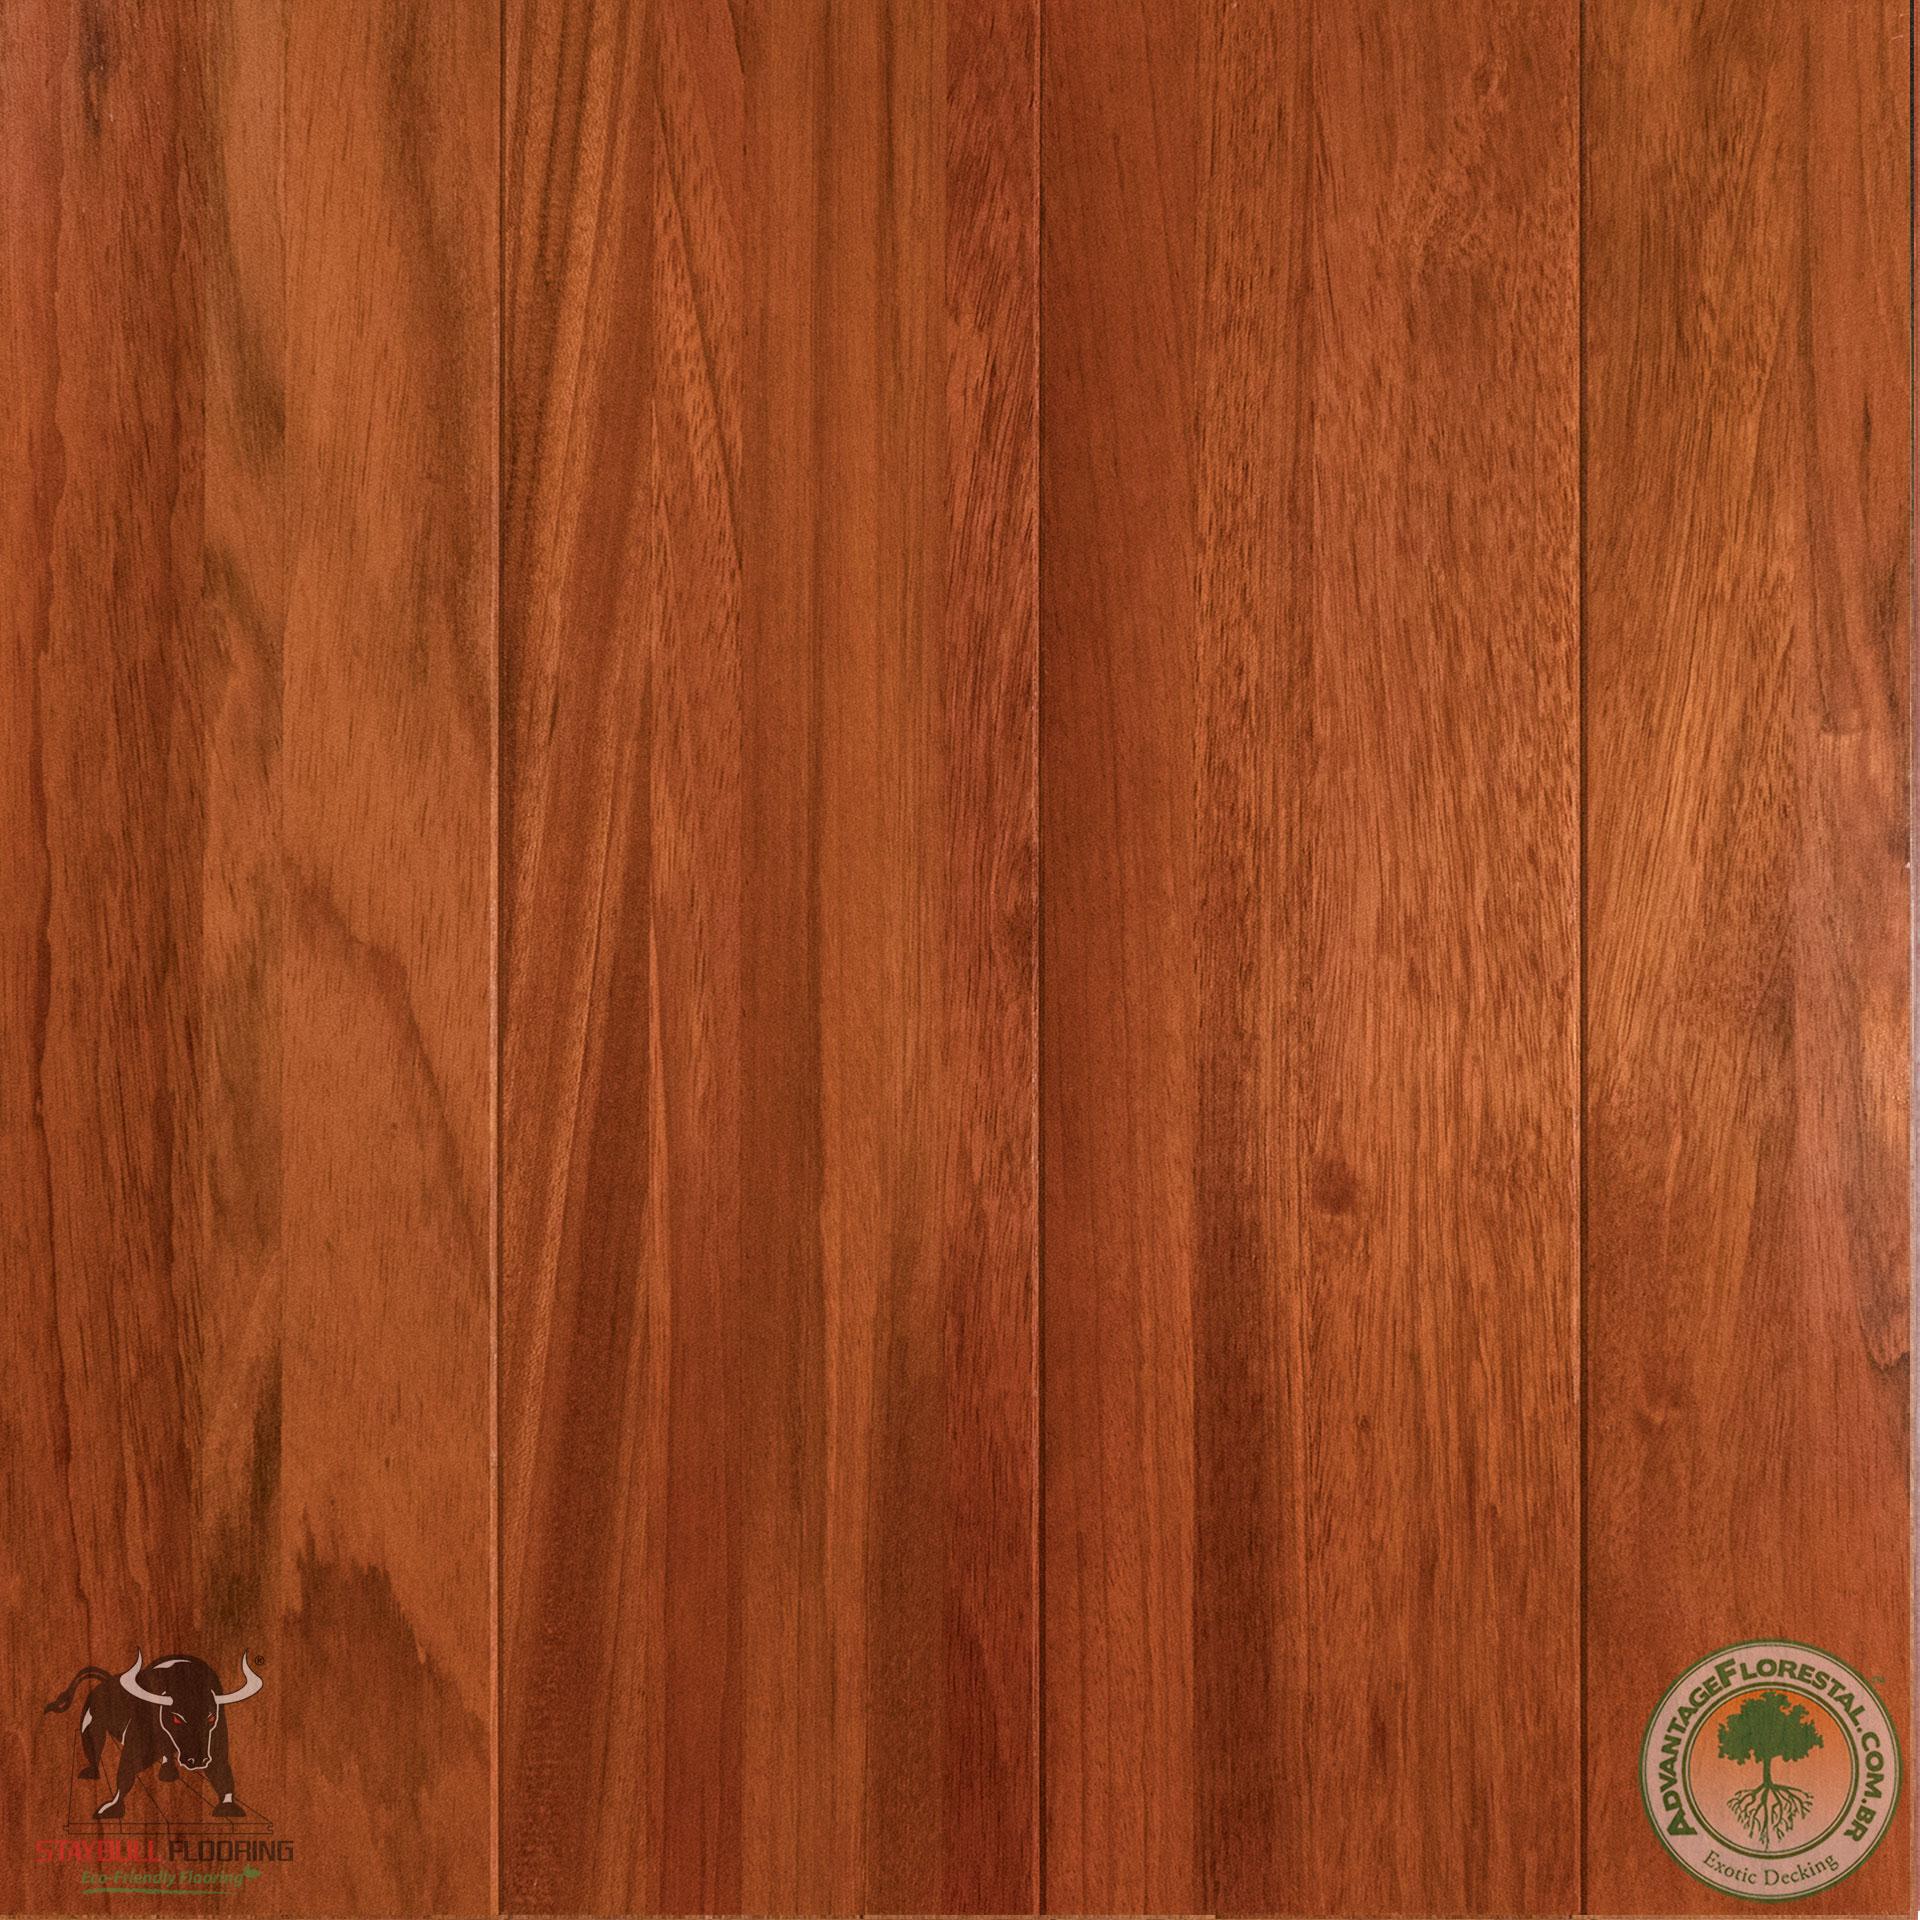 Wholesale StayBull Brazilian Cherry Hardwood Flooring